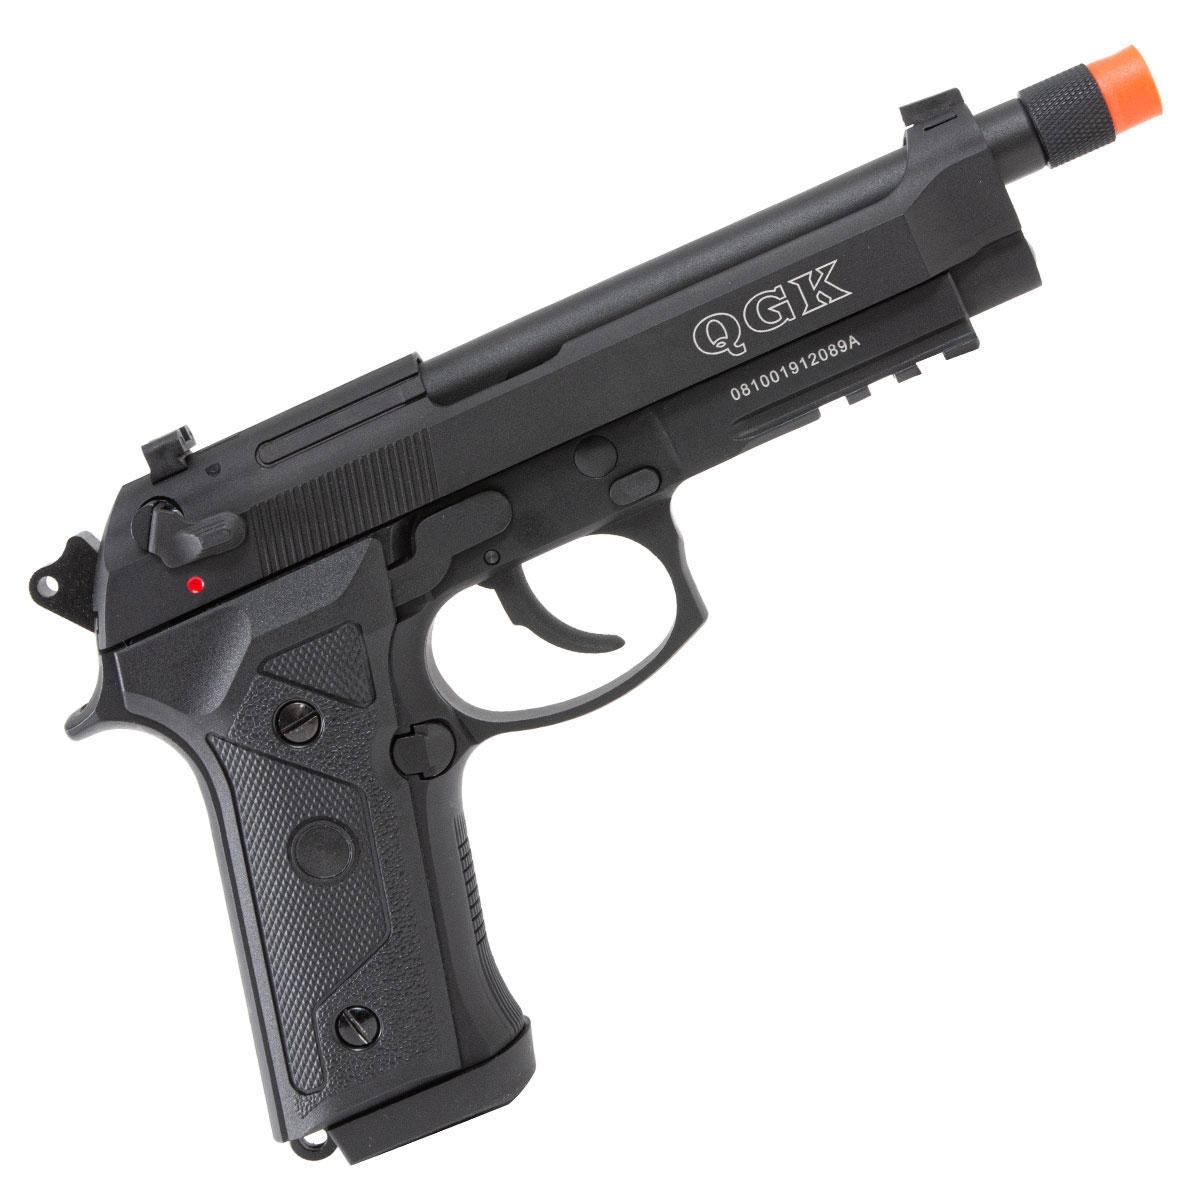 Pistola de Airsoft QGK 92 A3 BK GBB a Gás